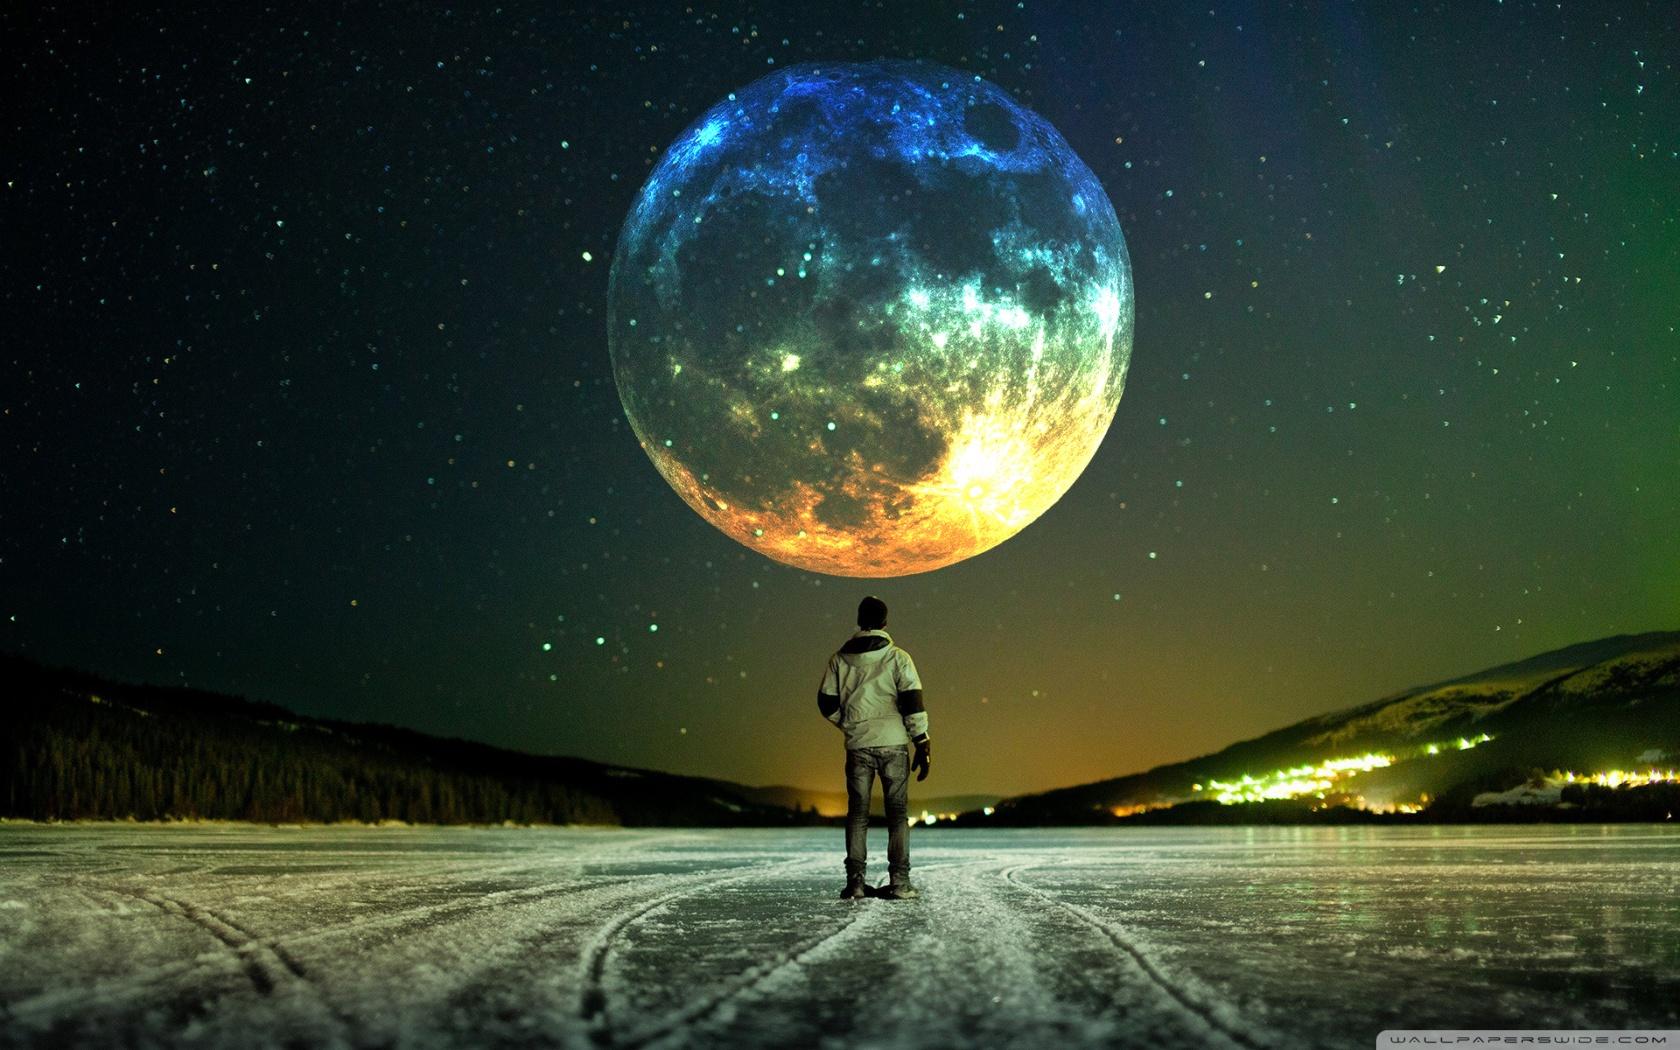 Best Wallpapers Moon 1680x1050 Wallpaper Teahub Io